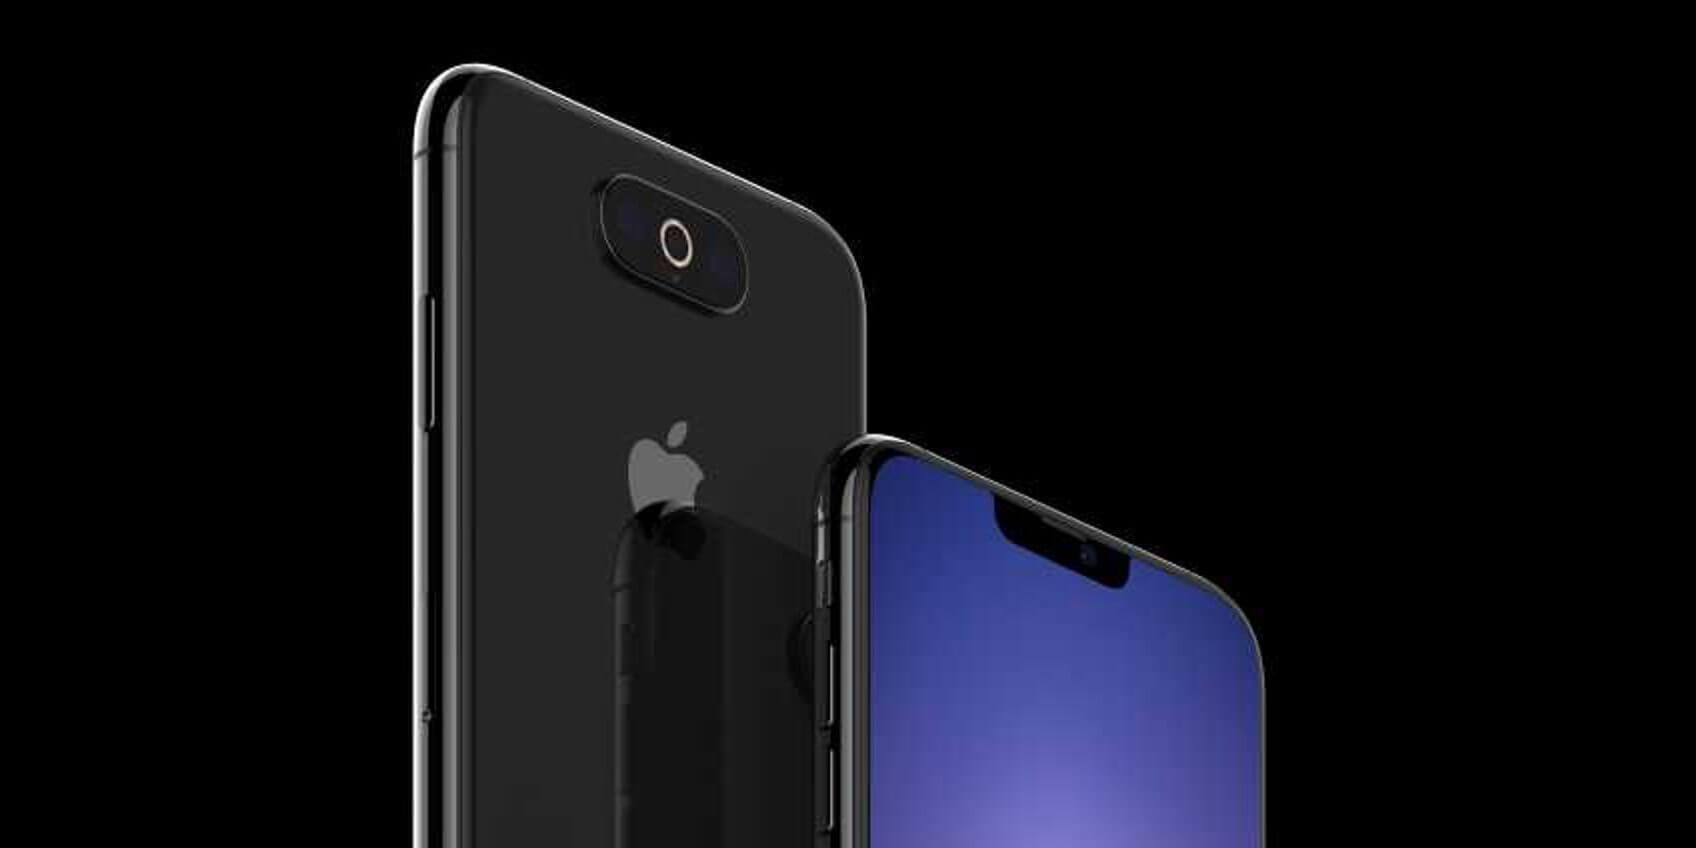 iPhones 2019: Zwei OLED-Modelle mit Triple-Cam?